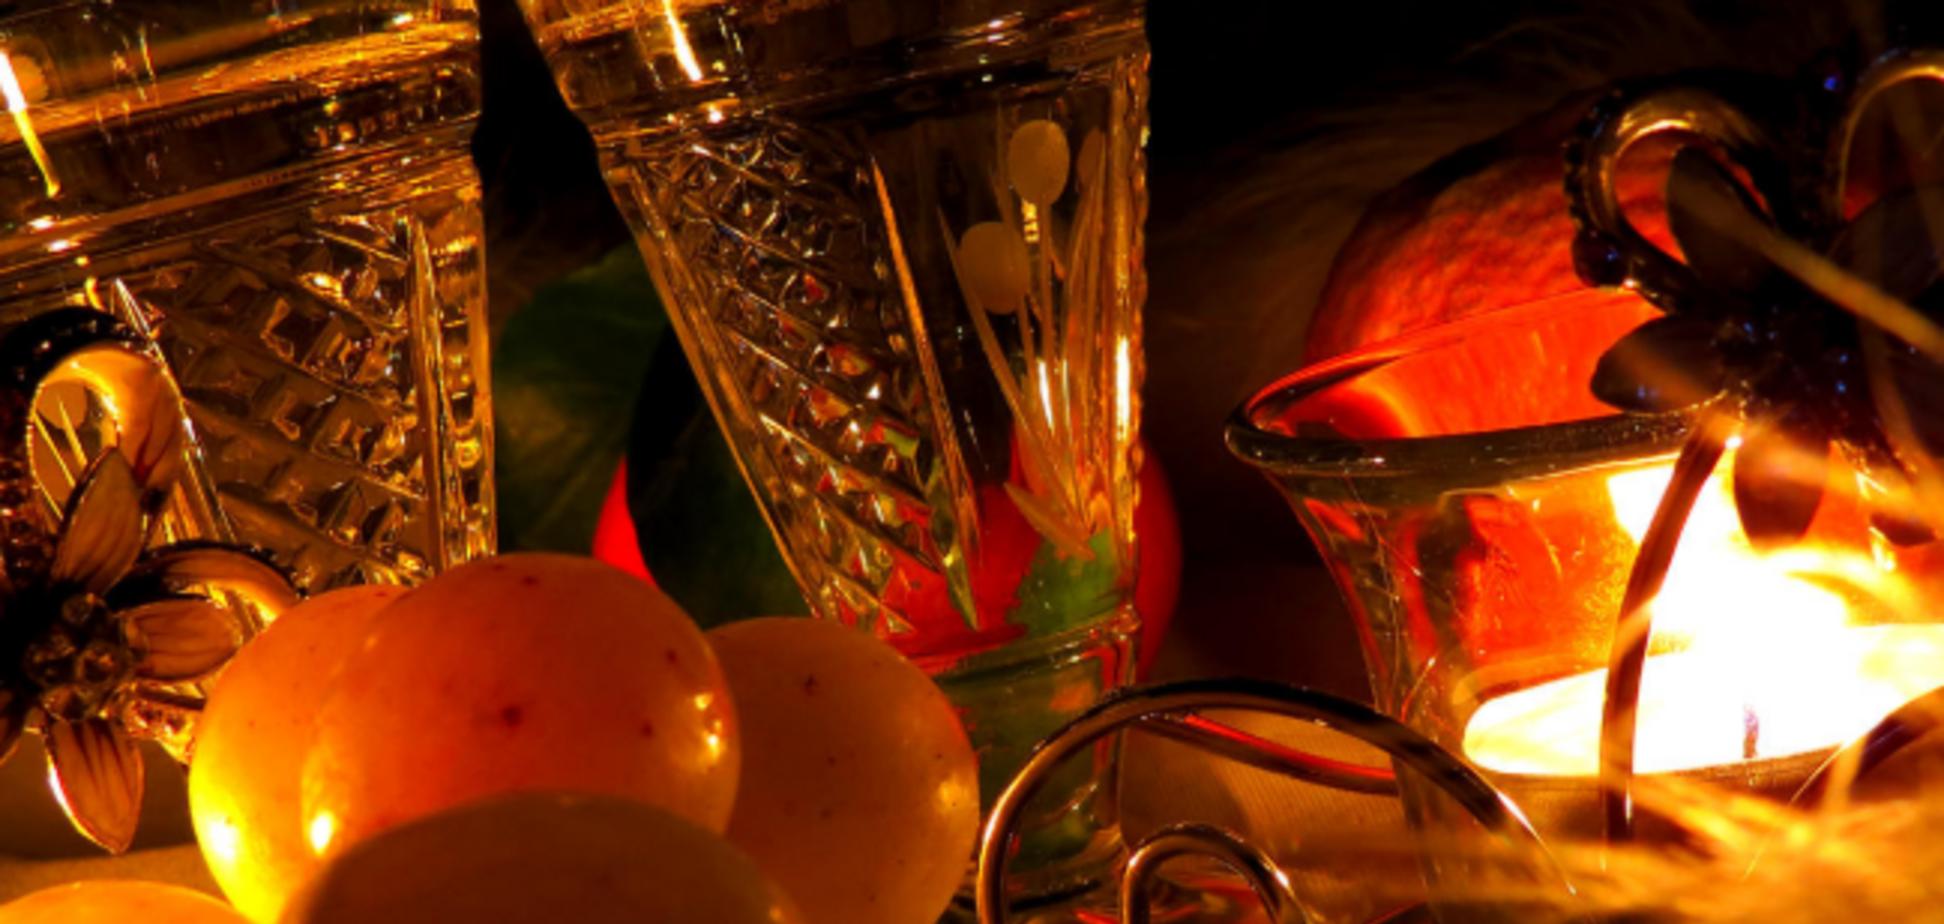 Рецепт смачної грузинської страви на романтичну вечерю 14 лютого